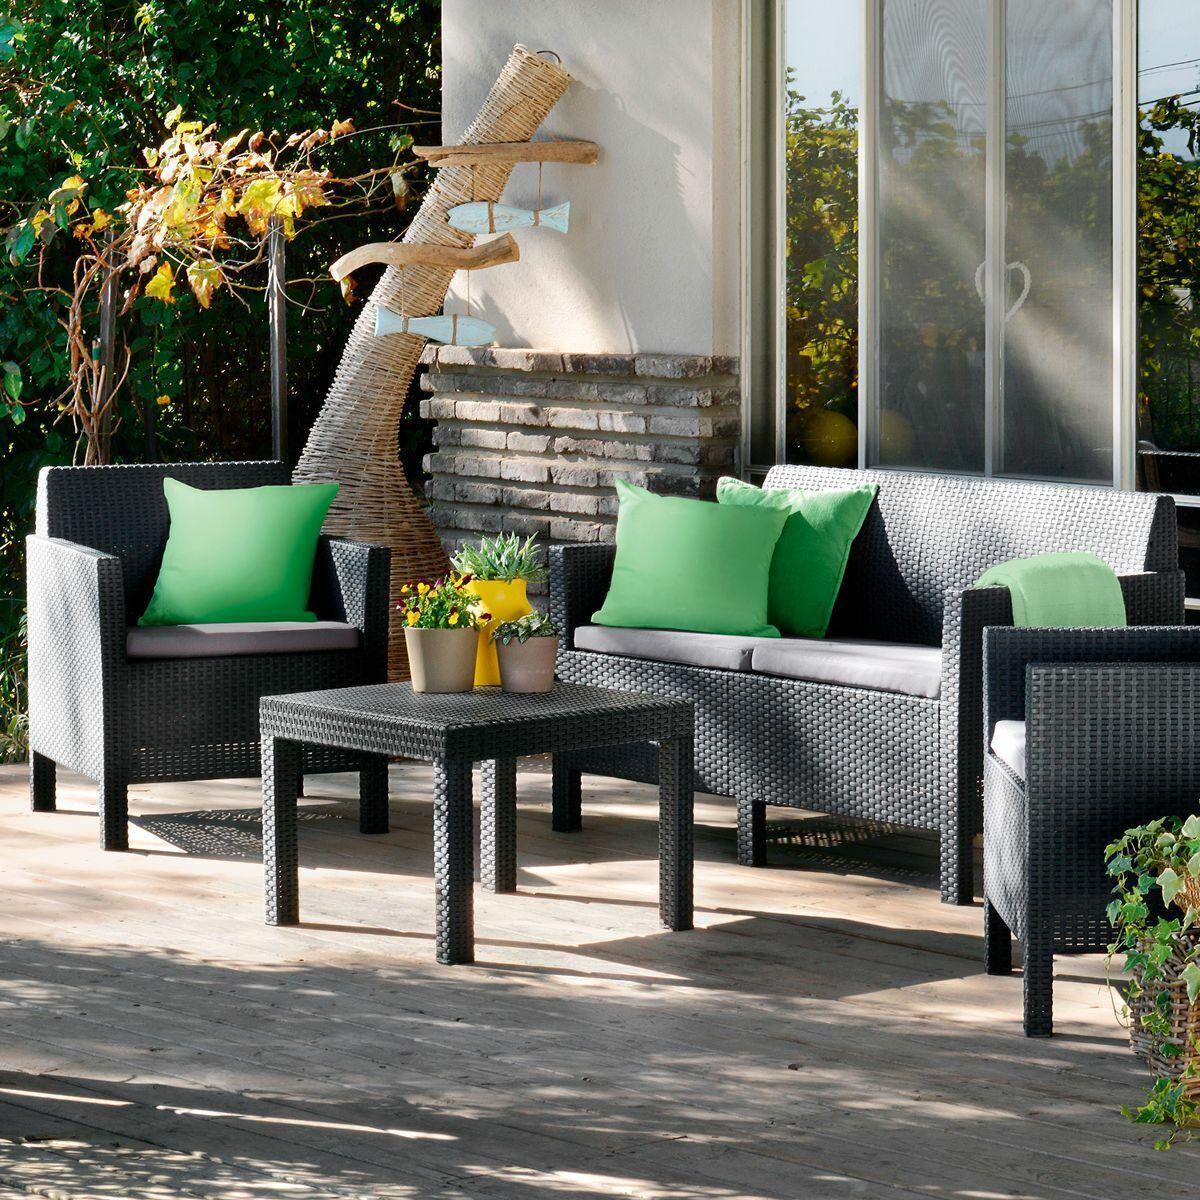 Garden Furniture - RATTAN GARDEN FURNITURE SET 4 PIECE CHAIRS SOFA TABLE OUTDOOR PATIO CONSERVATORY